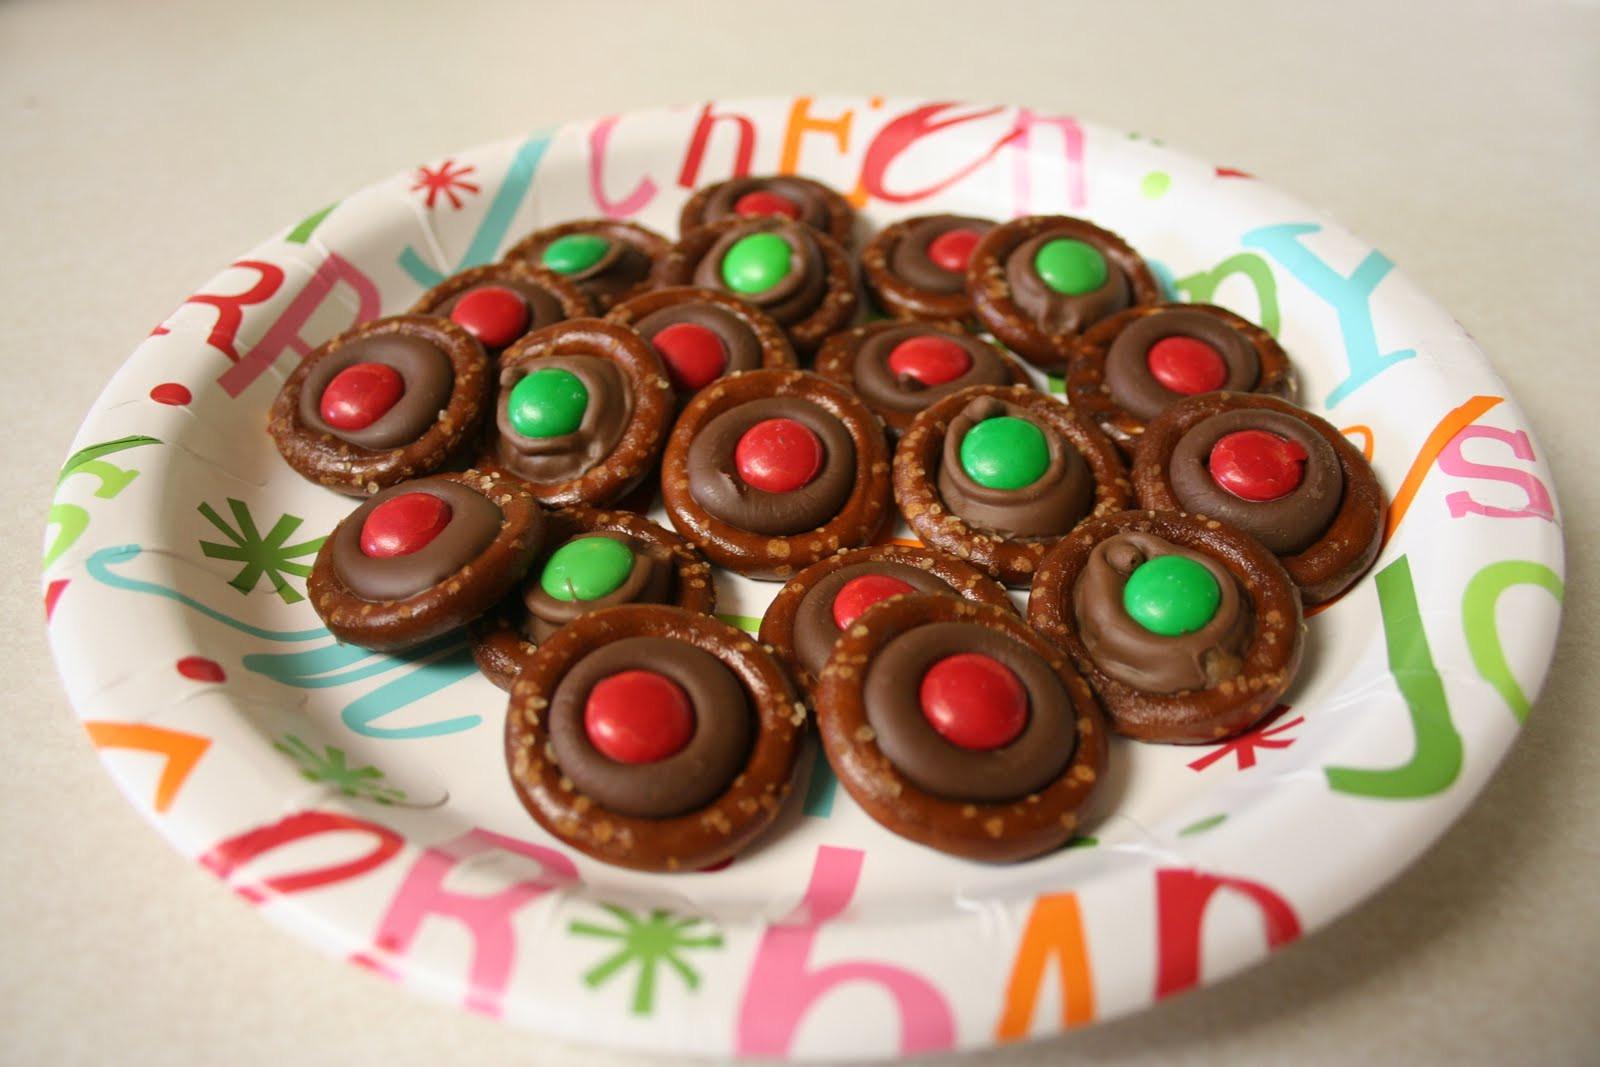 Christmas Pretzels Recipes  Chelsea Gets Married Christmas Recipe 1 Chocolate